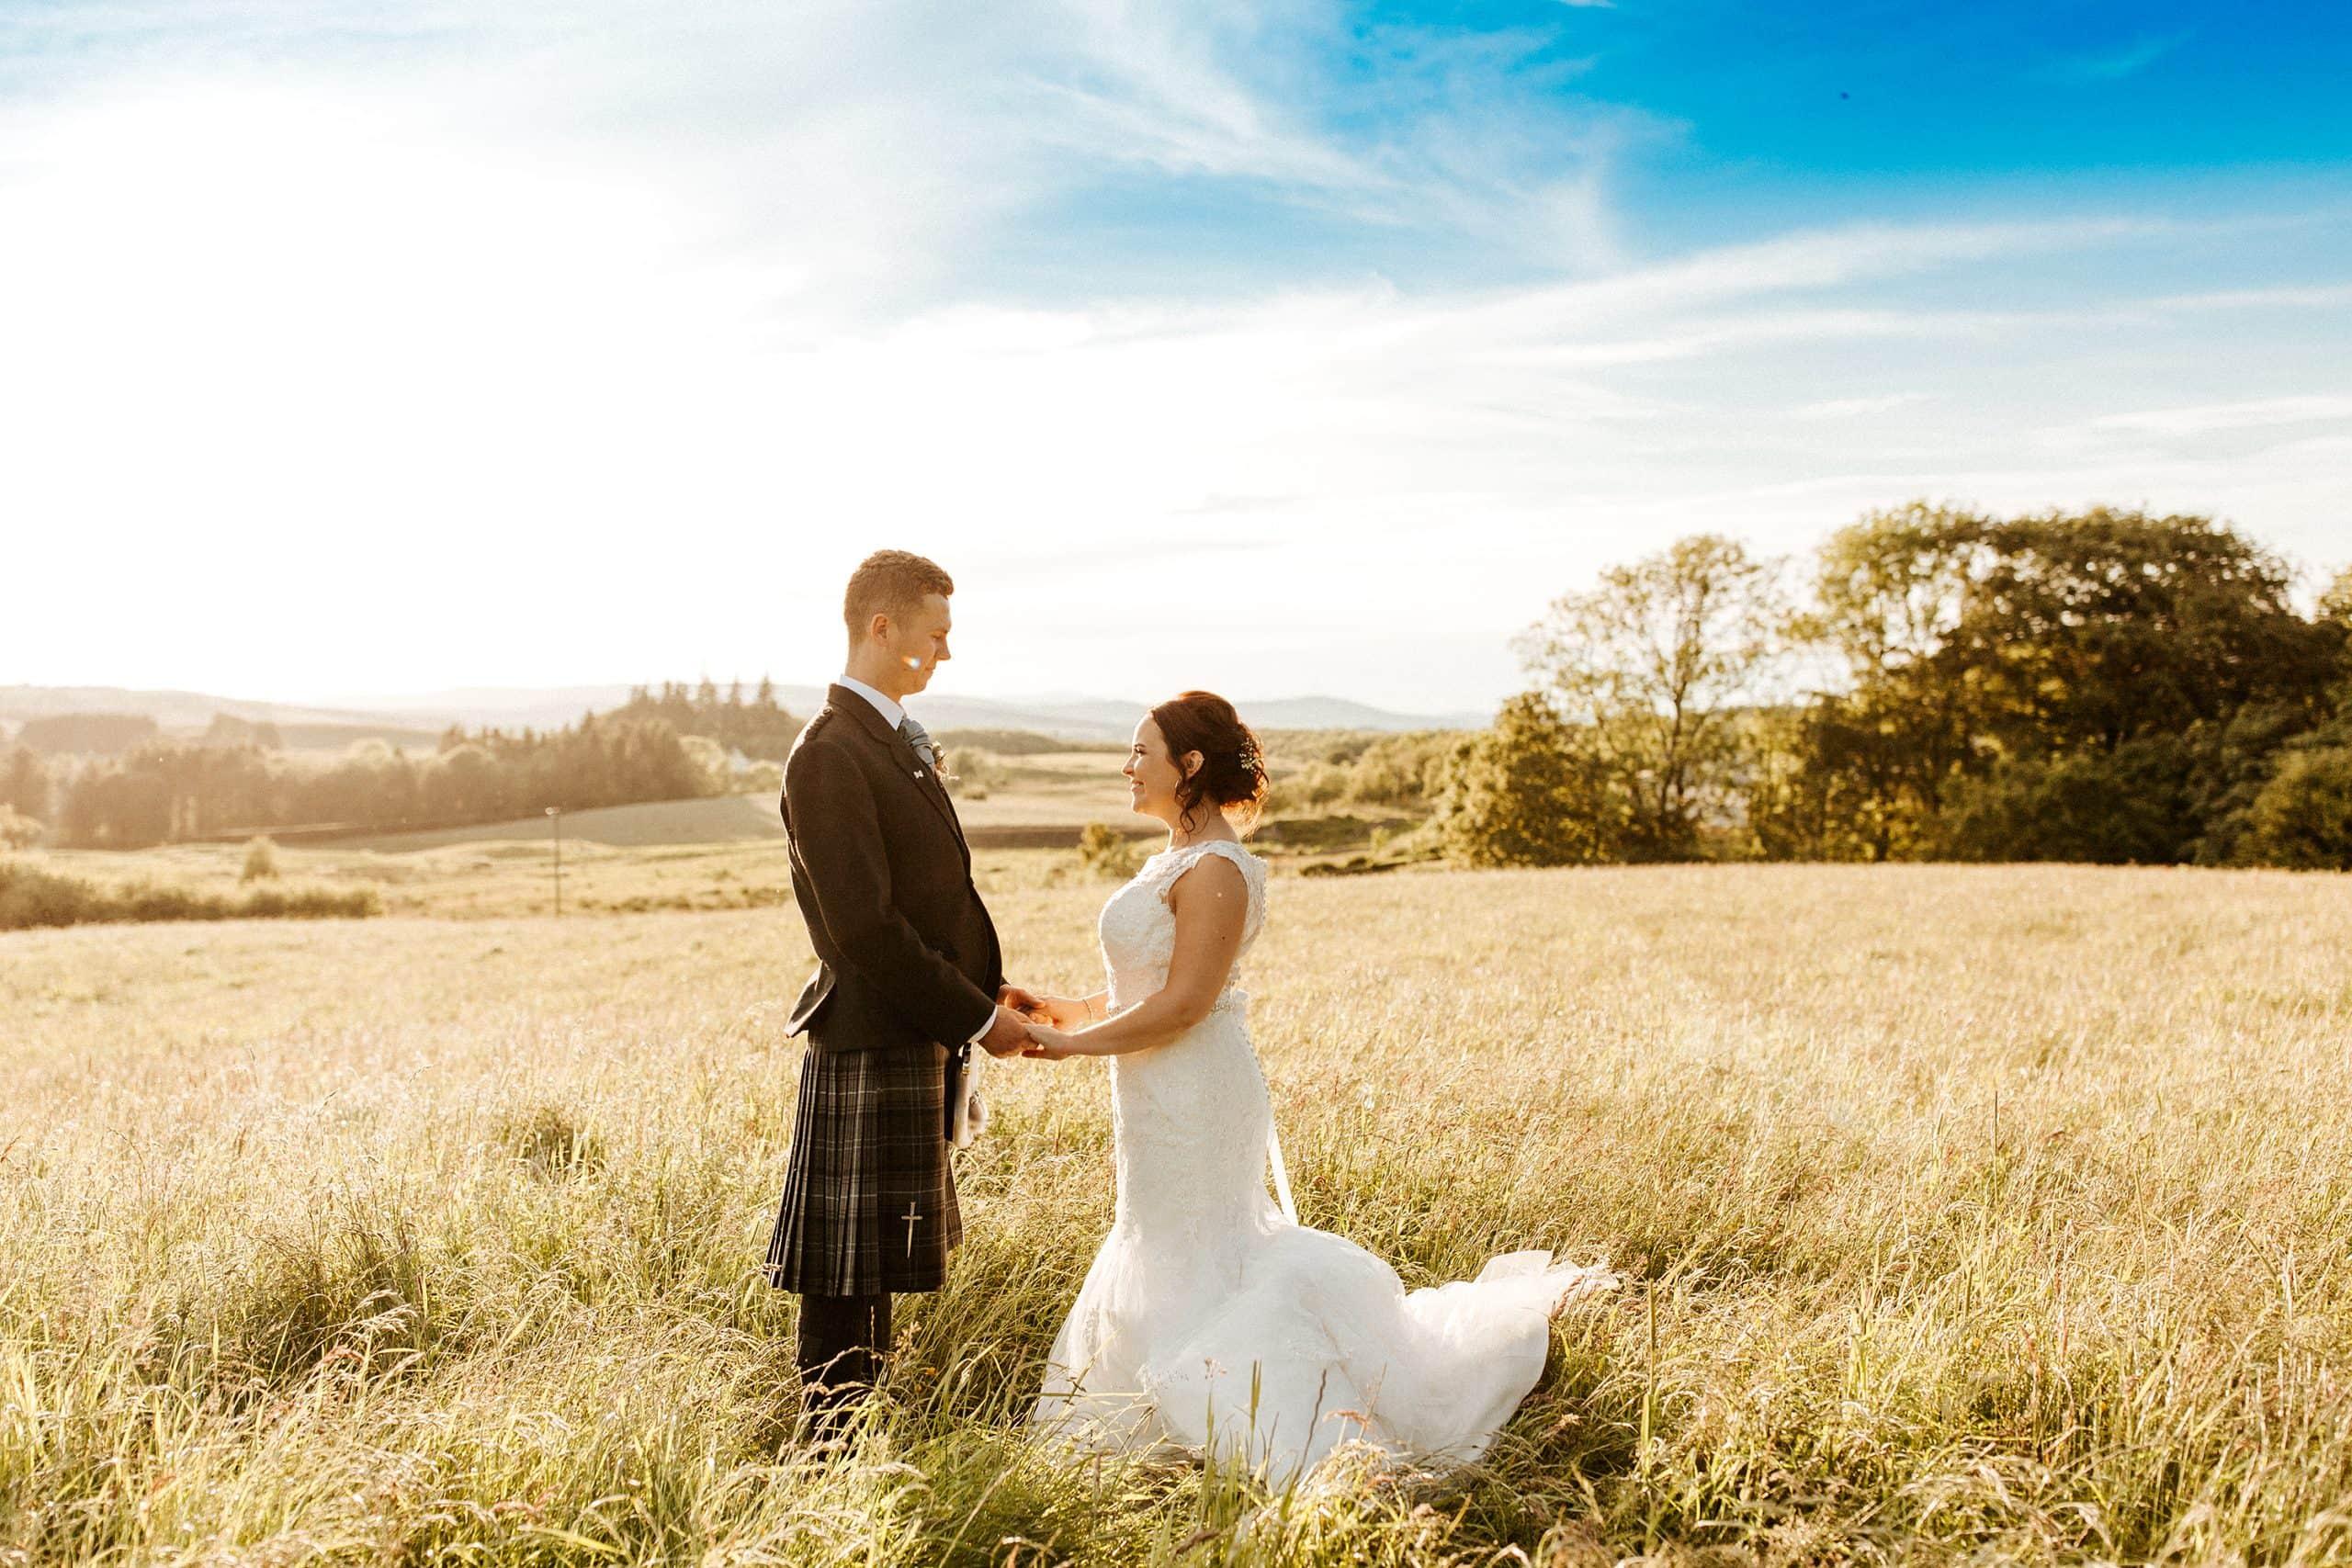 craigadam wedding photography